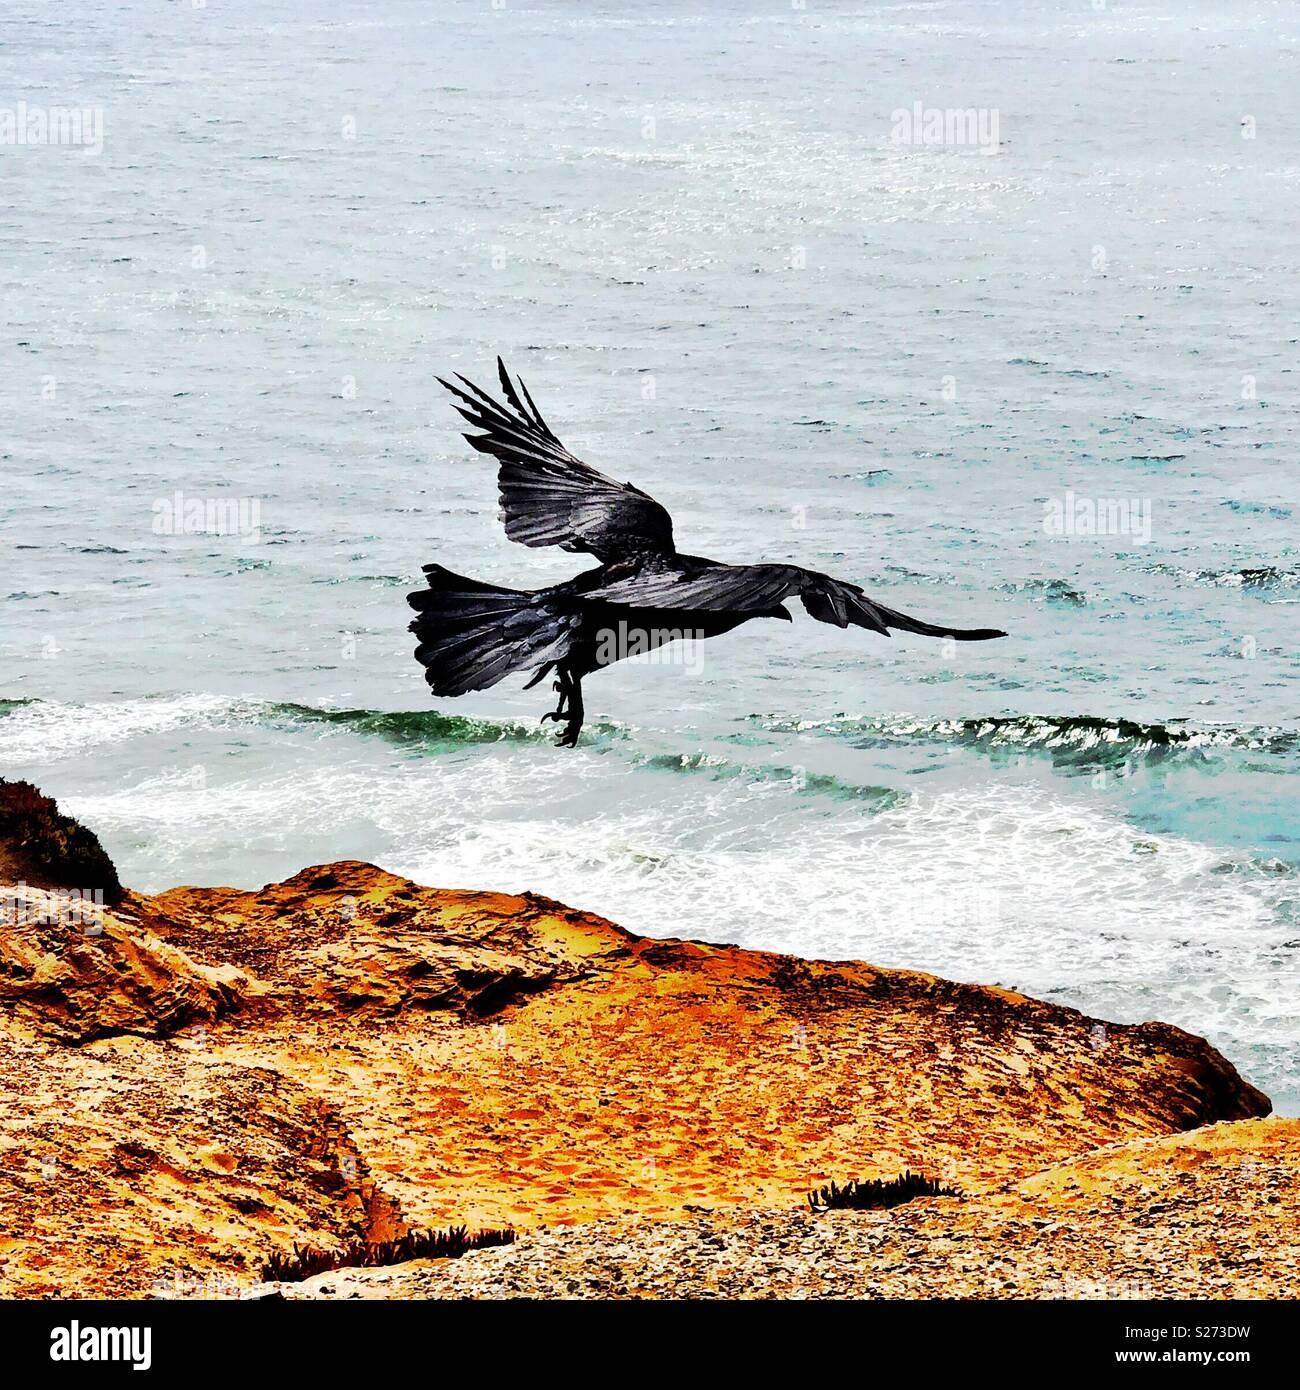 Jet black raven takes flight atop coastal cliffs high above the torrid sea below. Stock Photo